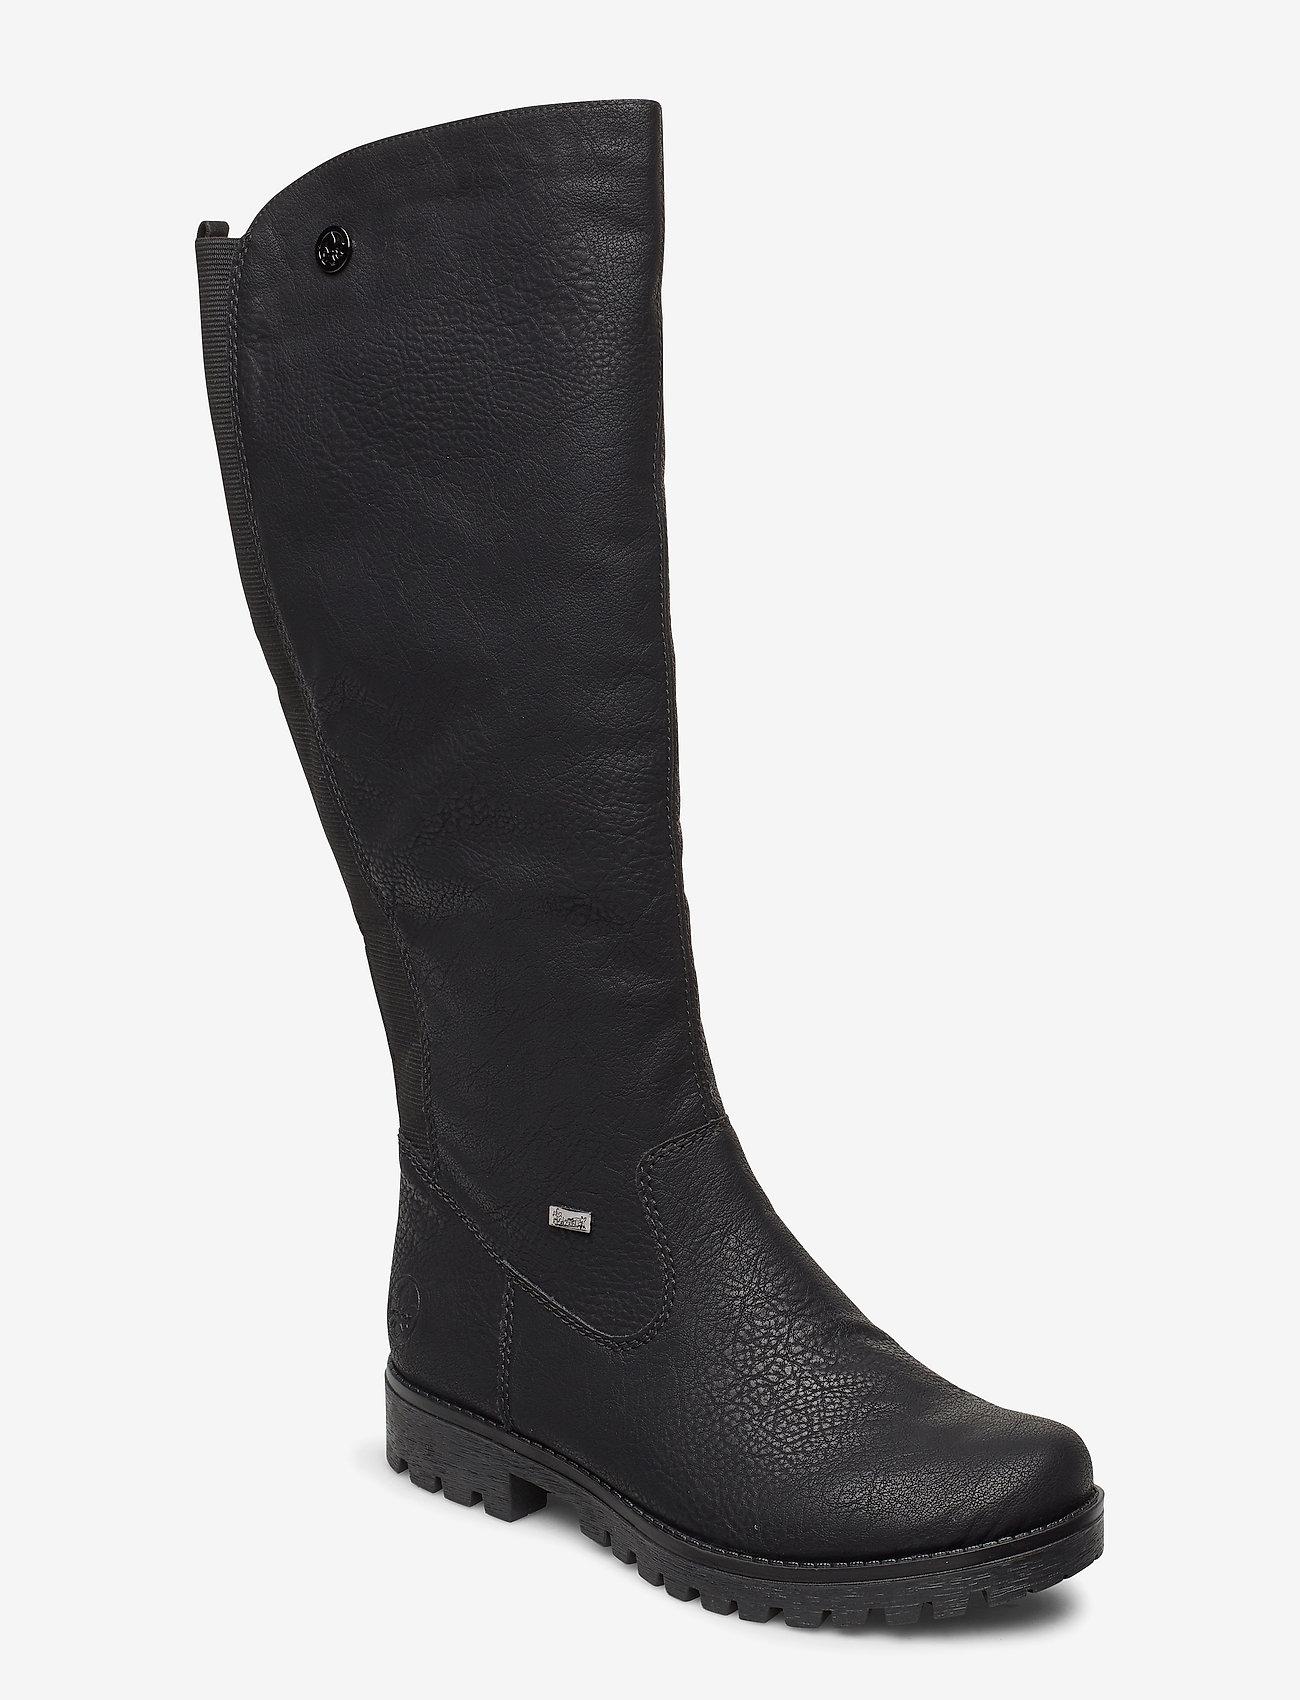 78554 00 (Black) (999 kr) Rieker |